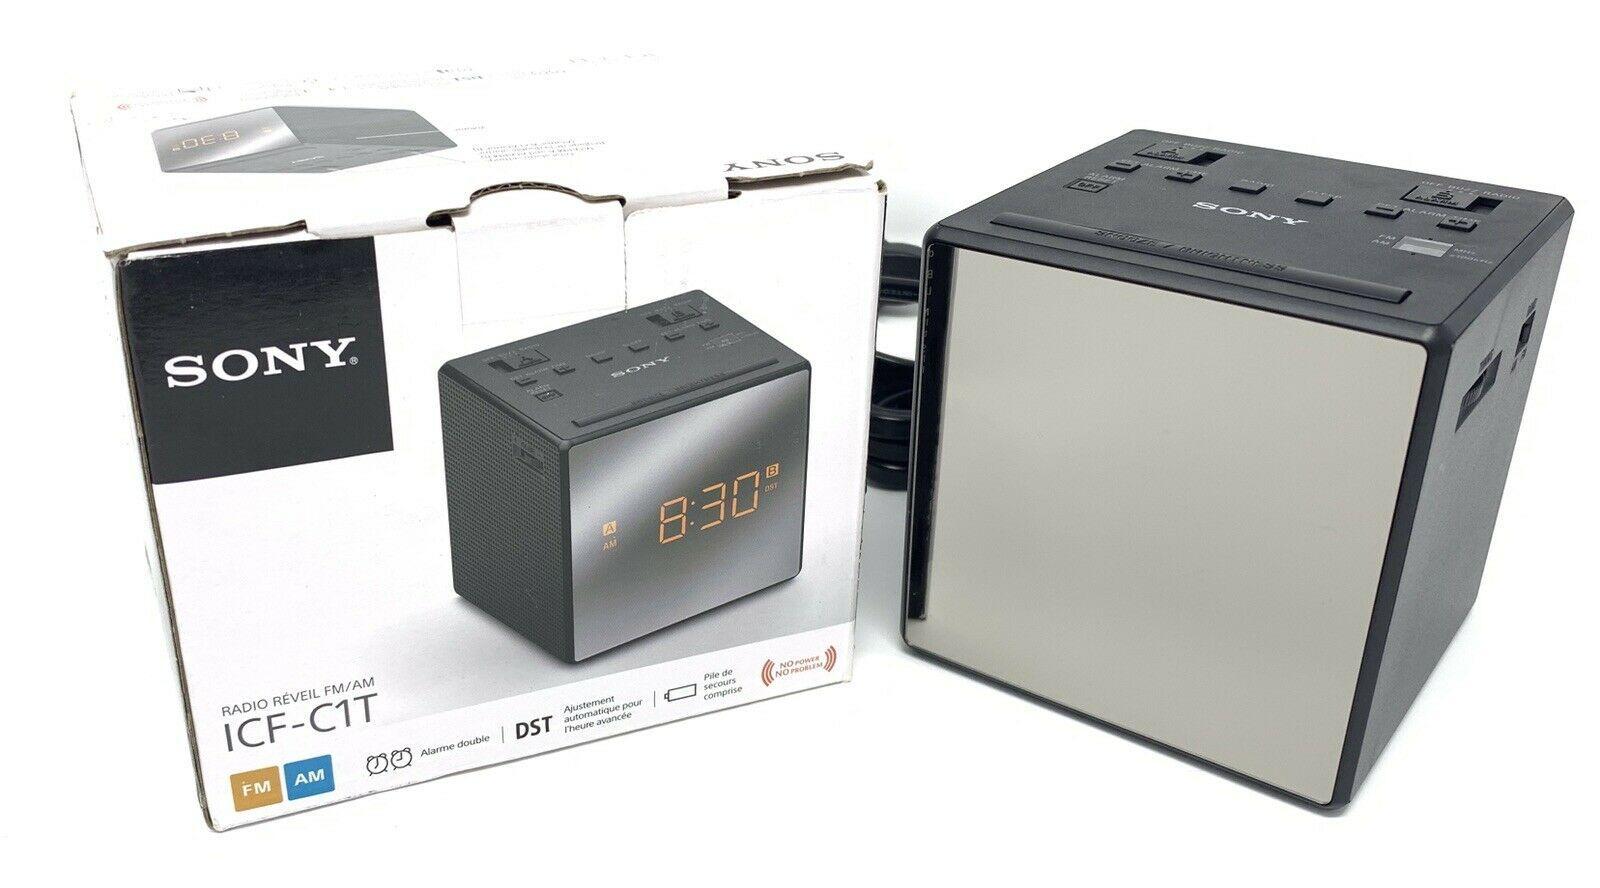 Sony ICF-C1T FM//AM Clock Radio-Black Battery Backup Dual Alarm New!